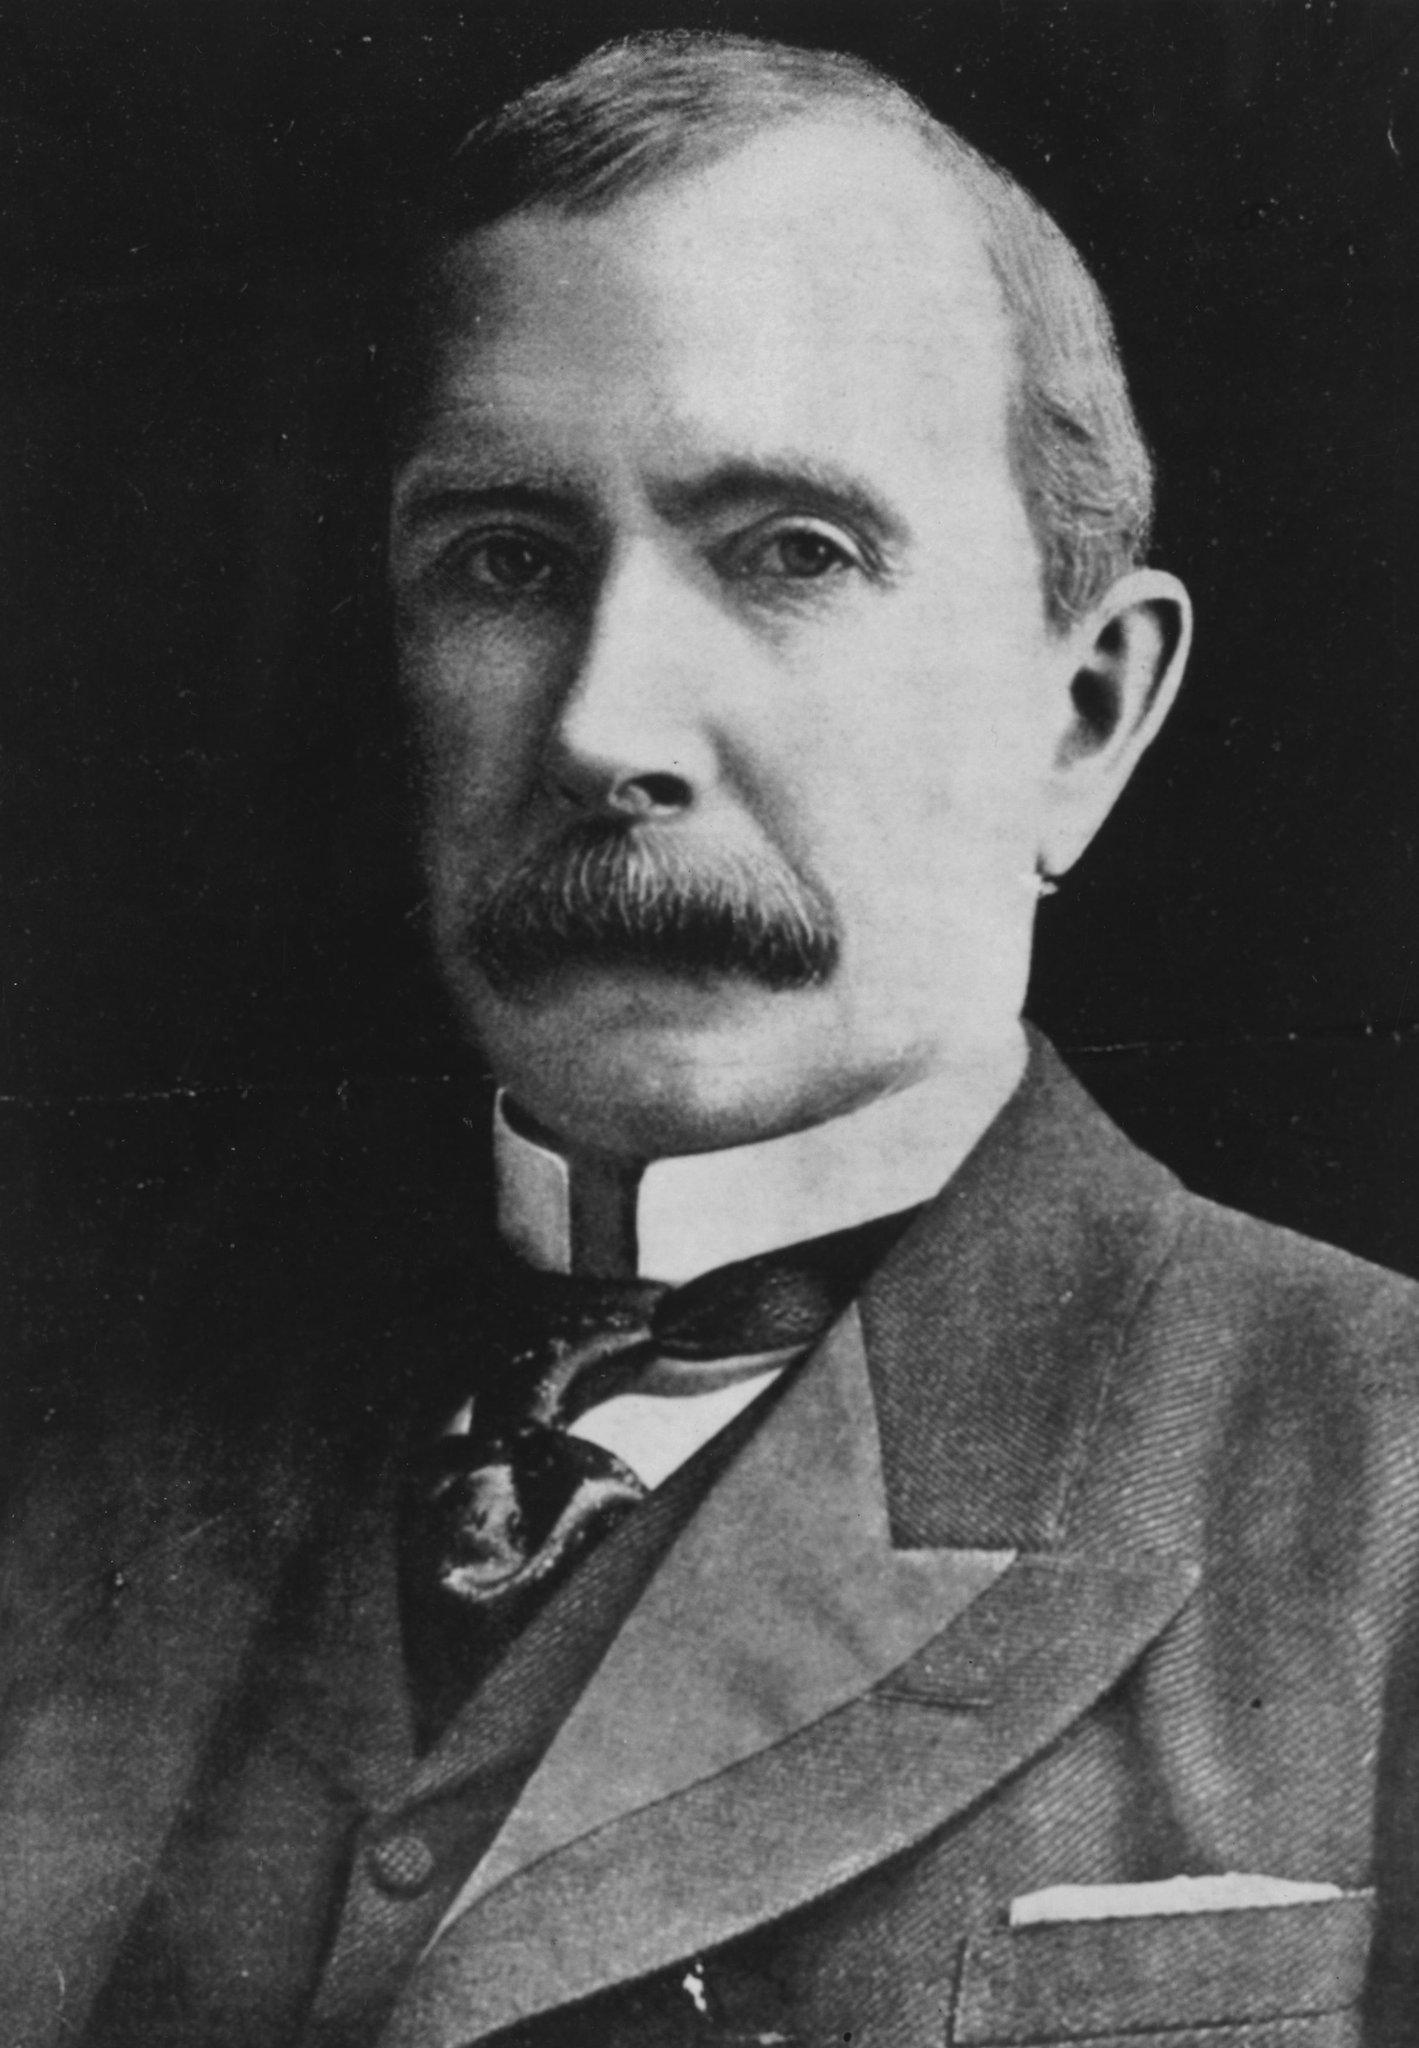 the life of industrialist john d rockefeller and his establishment of standard oil company